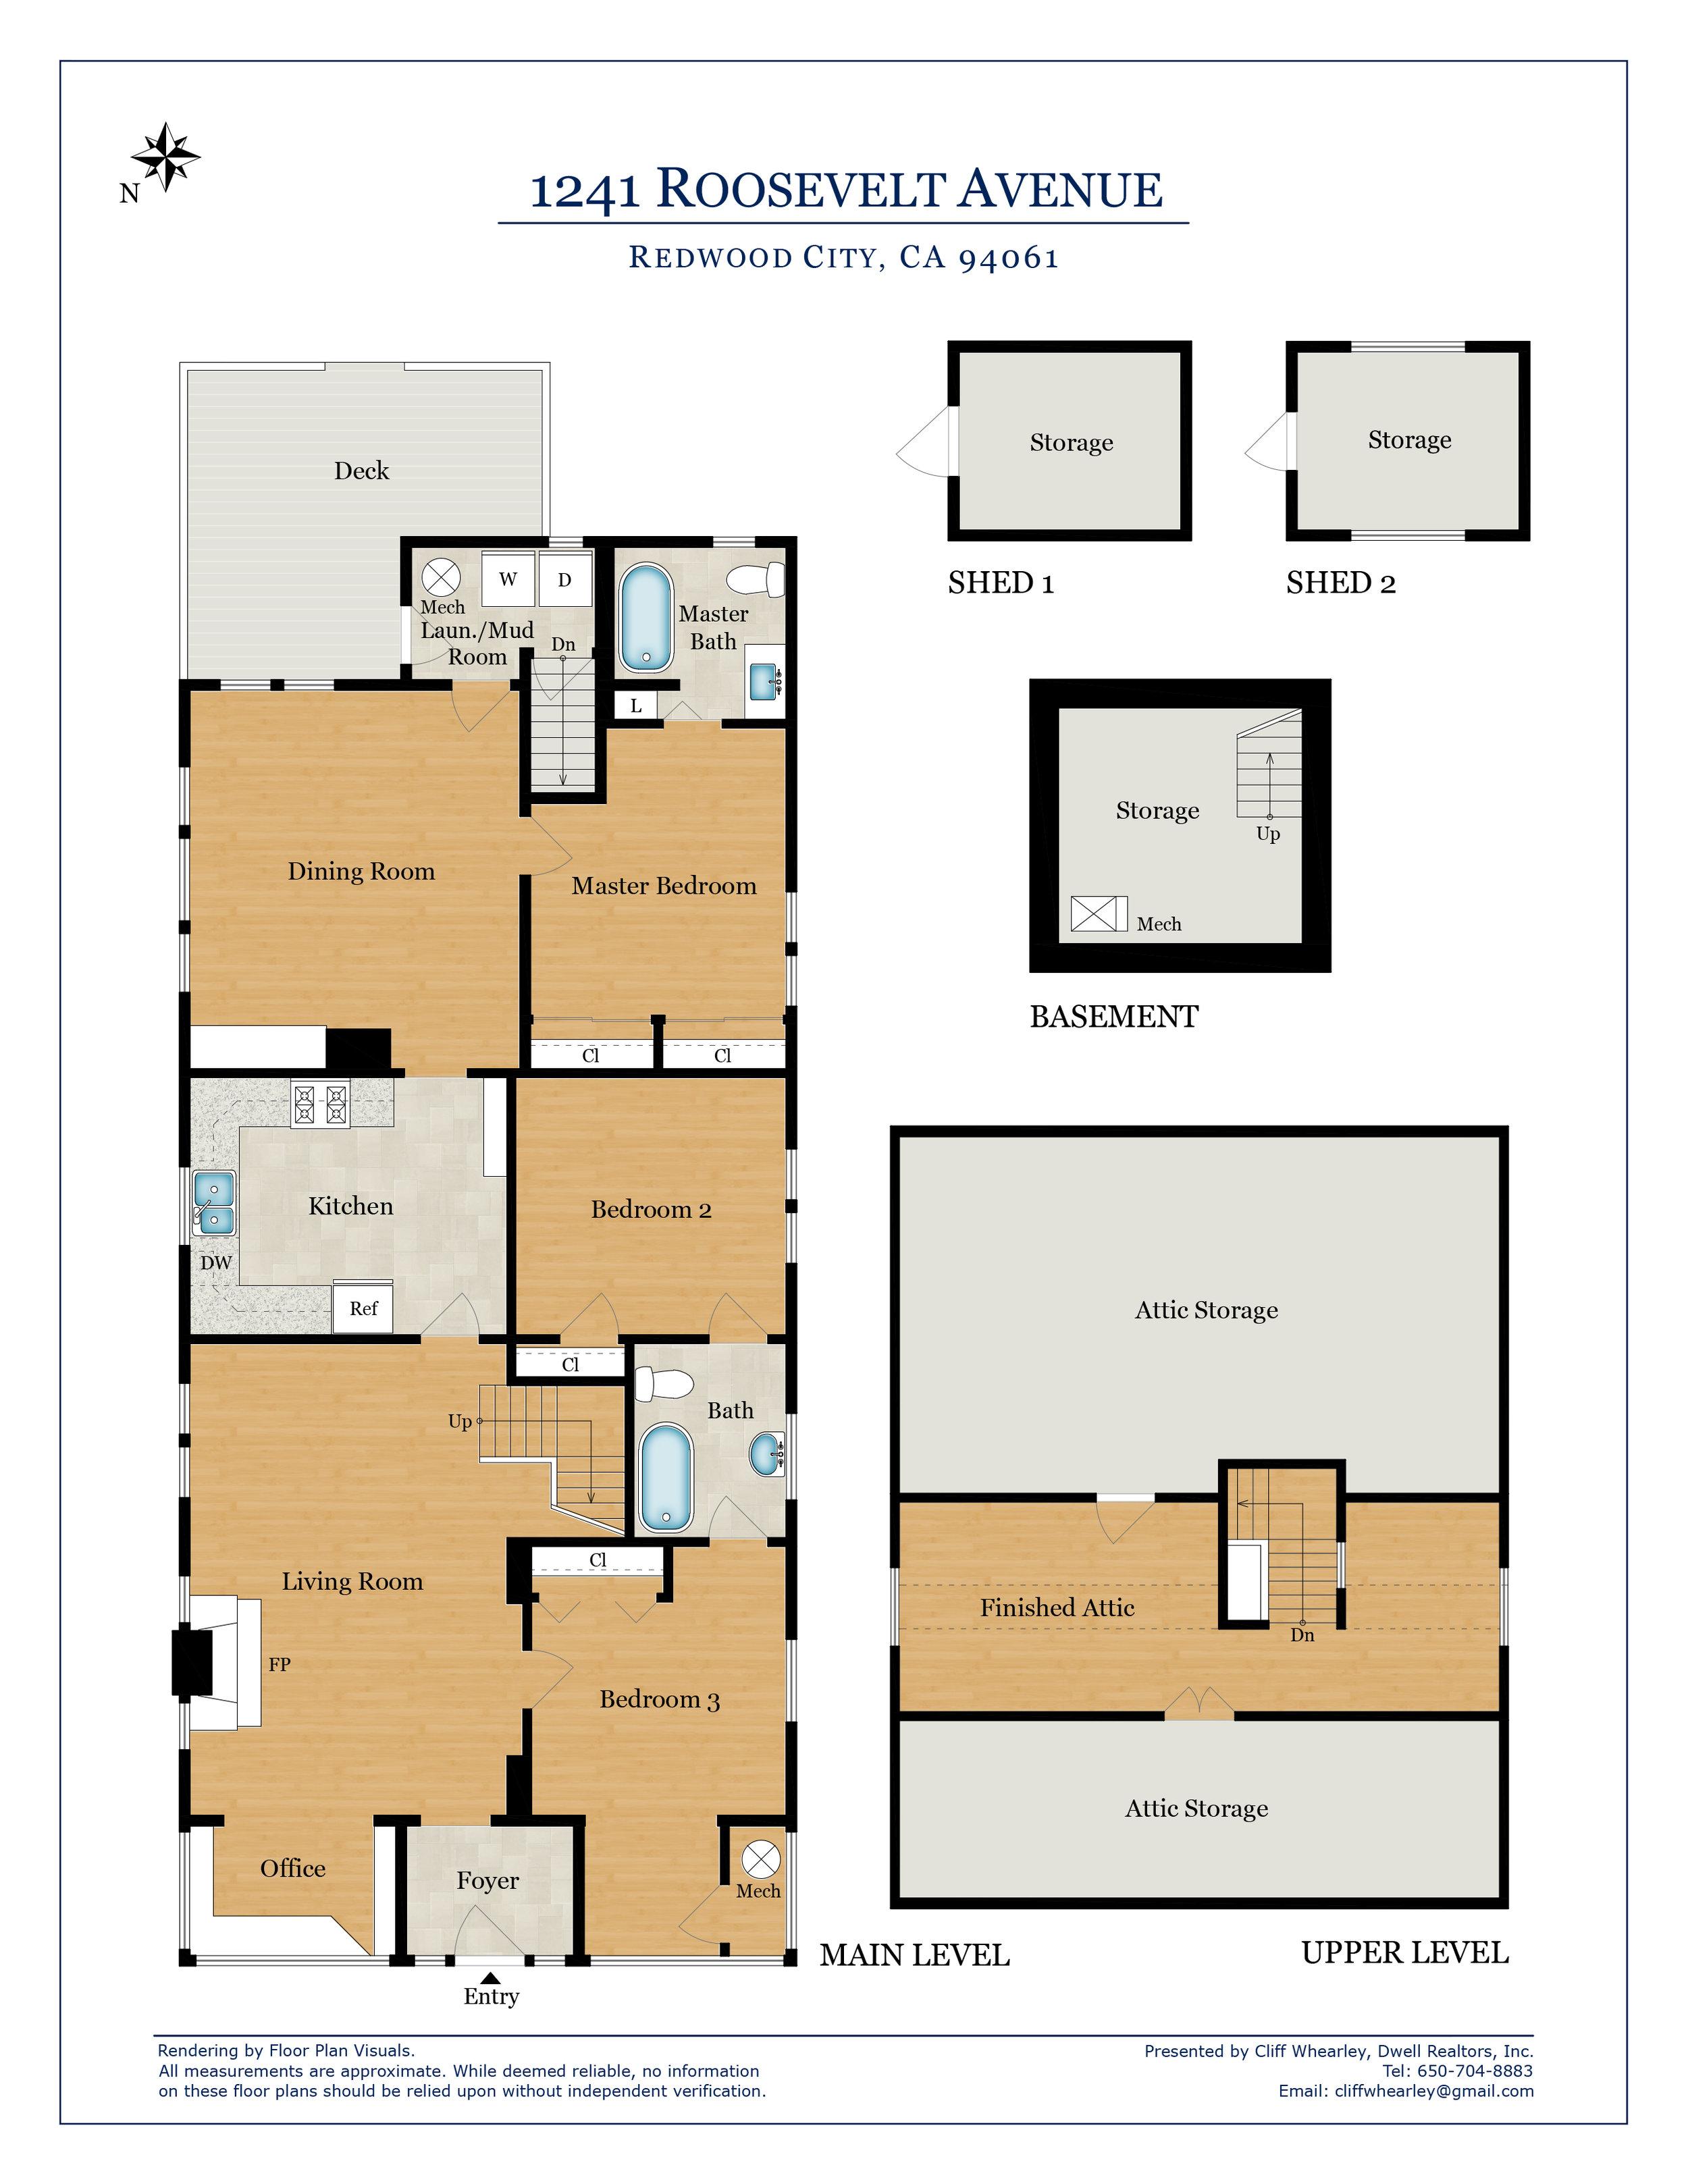 CW-1241RooseveltAve-FloorPlan-Print-R2.jpg